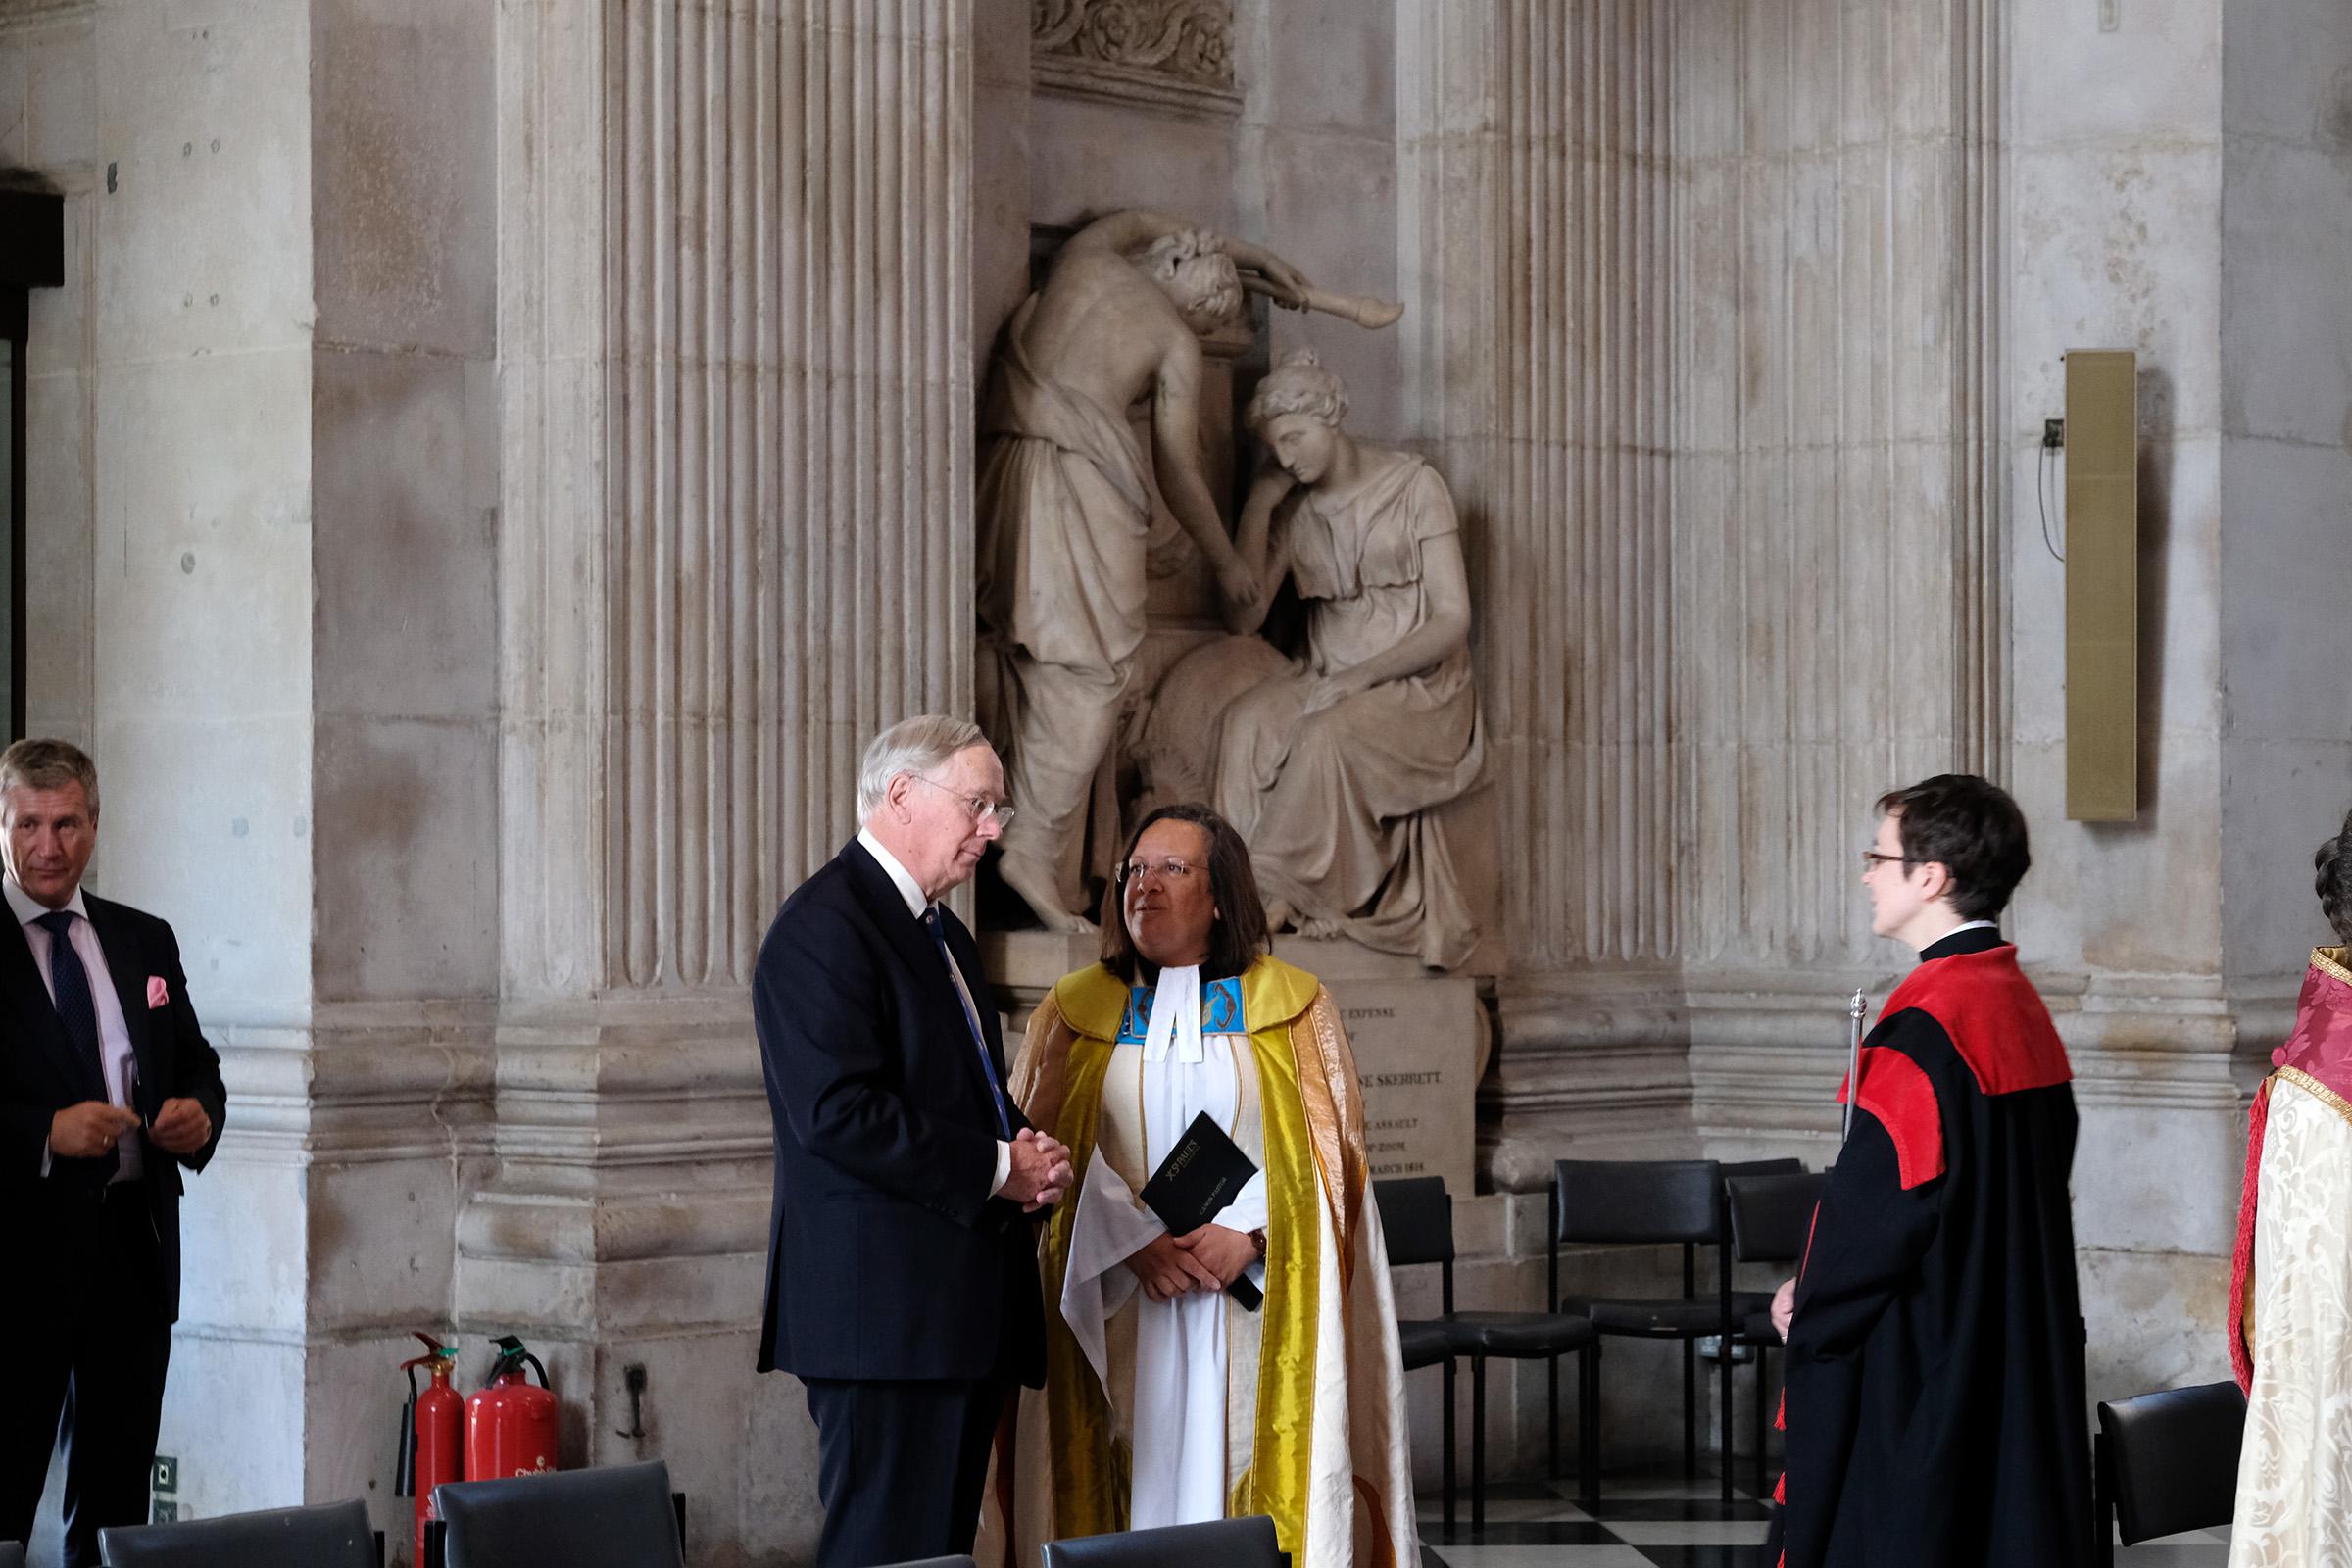 HRH the Duke of Gloucester, Rev Canon Tricia Hillas